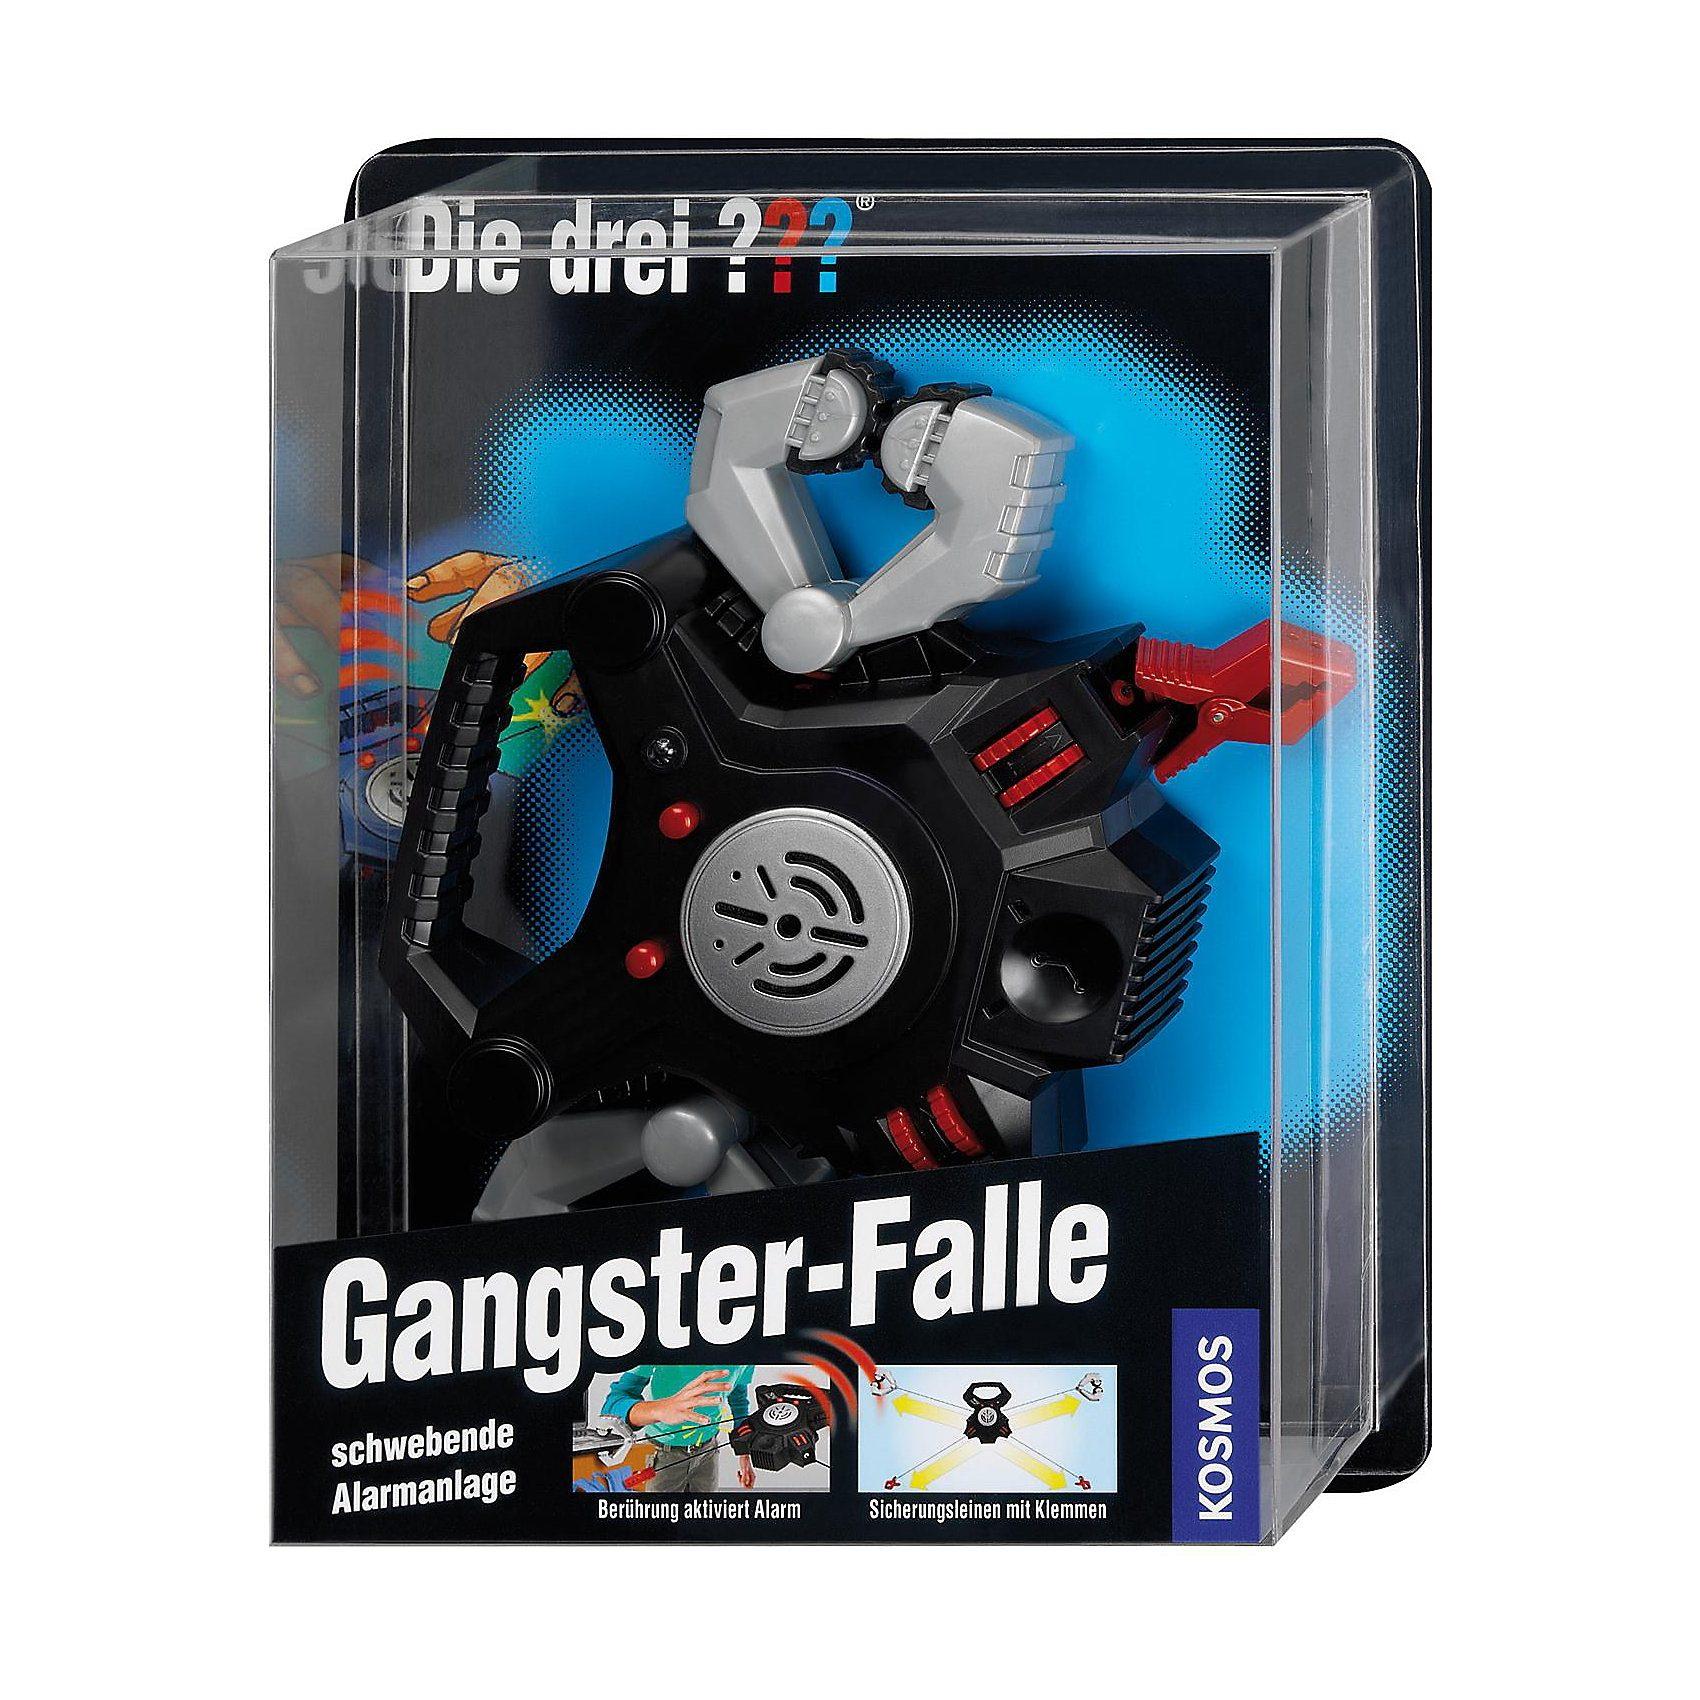 Kosmos Die drei ??? Gangster-Falle